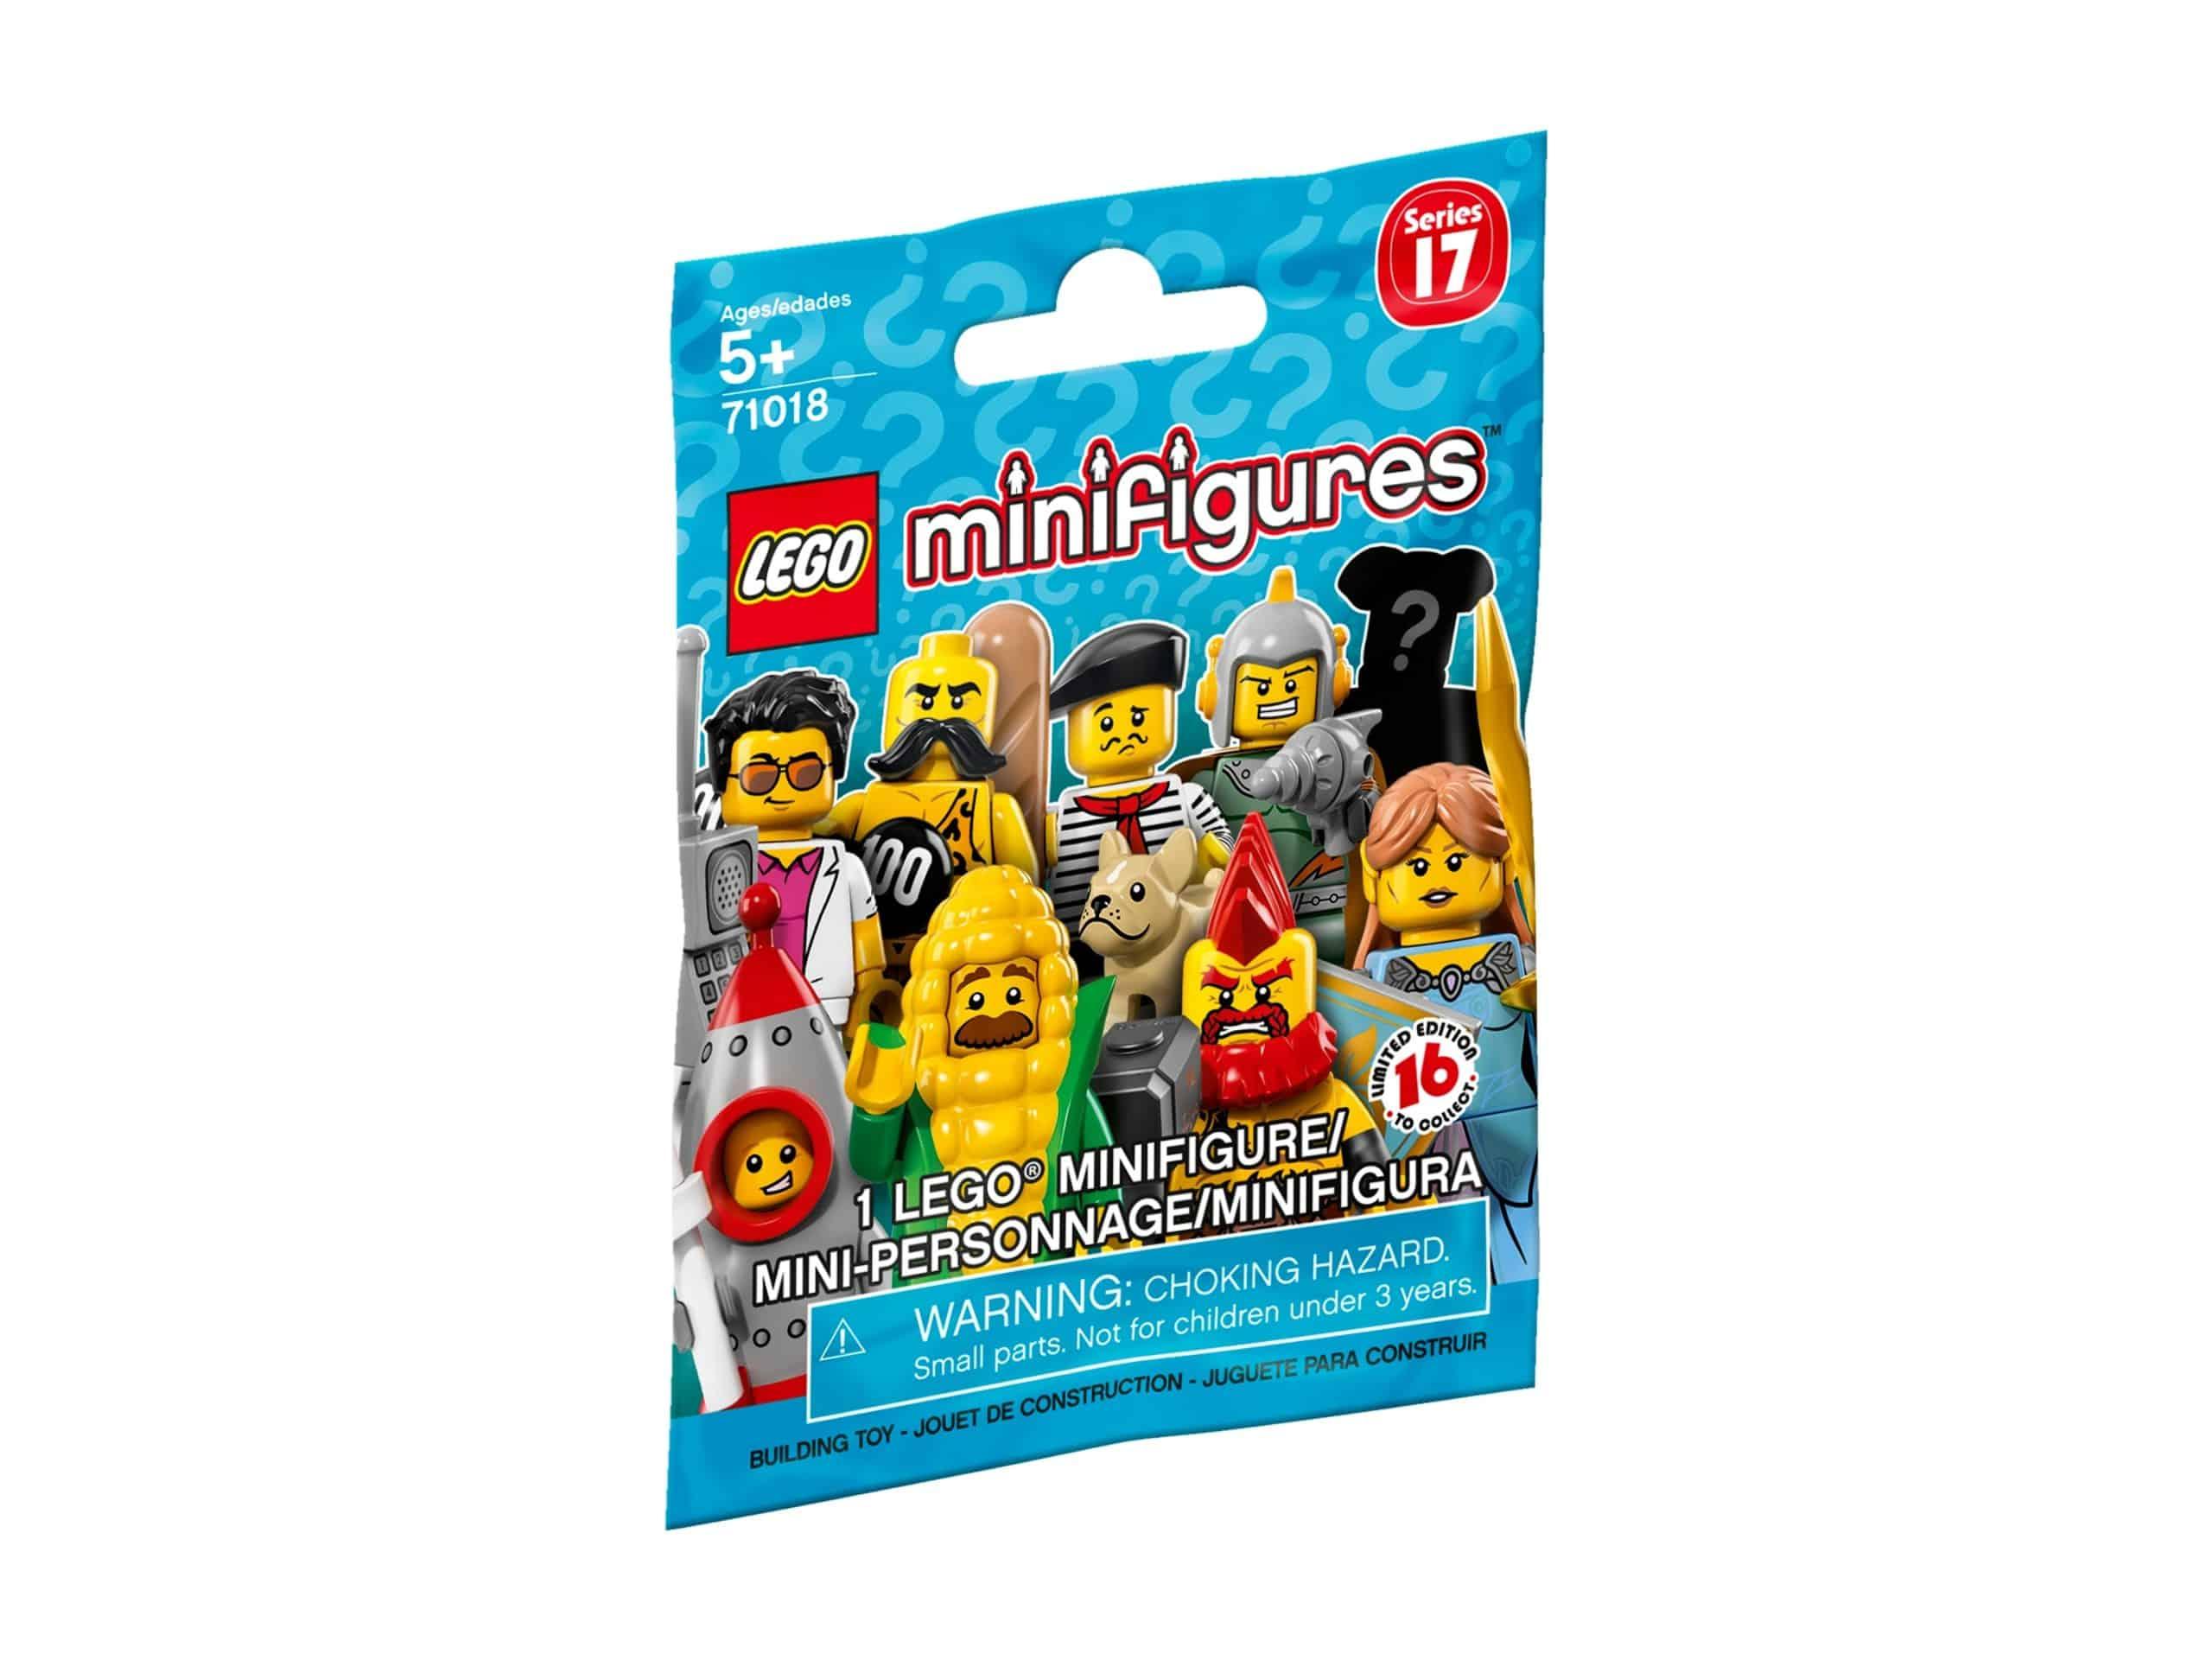 lego 71018 minifigures serie 17 scaled